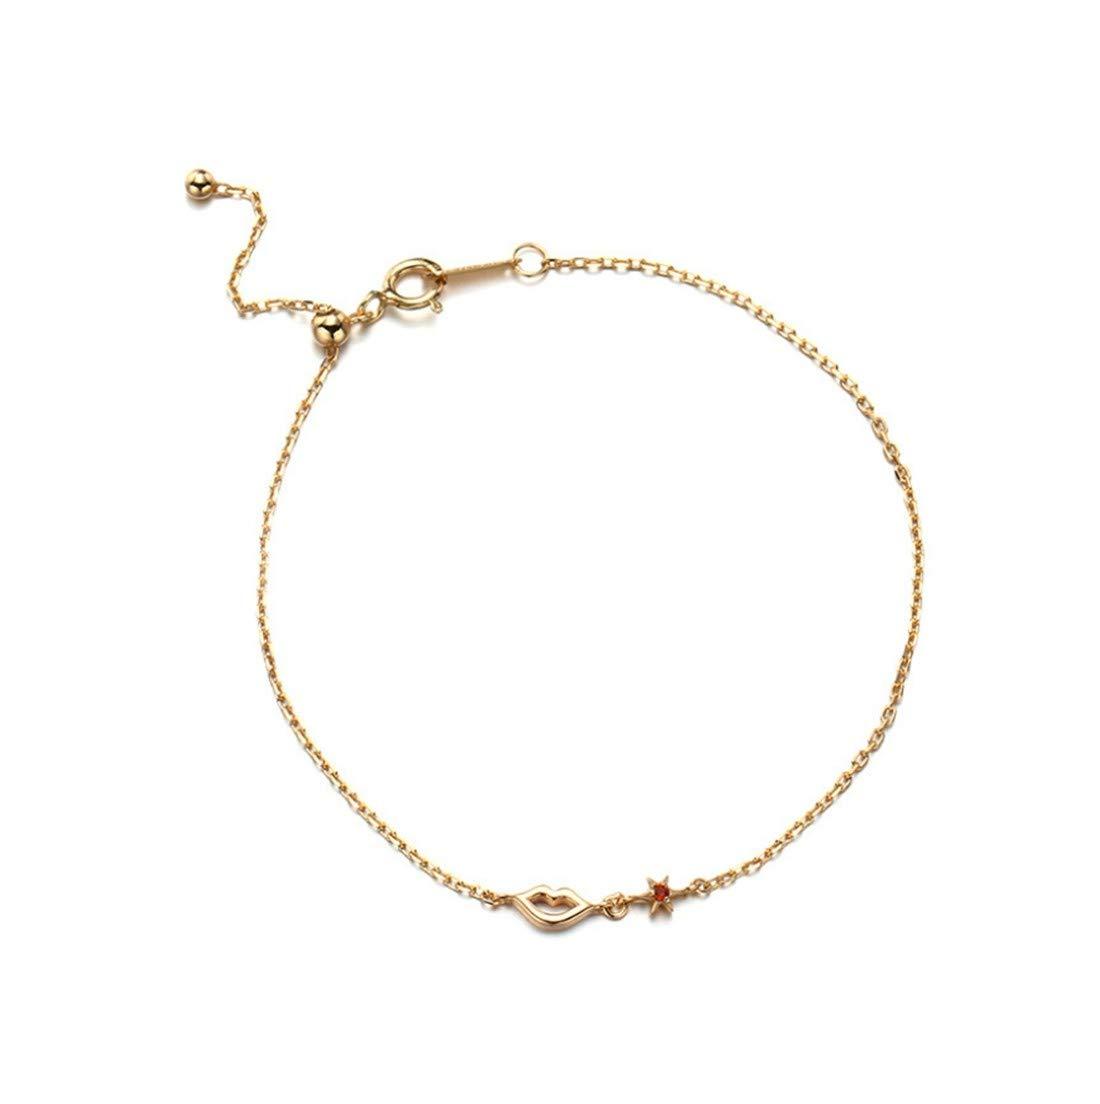 YIYIYAレディースブレスレットS925スターリングシルバー繊細な甘い唇の形調節可能な結婚式の宝石類レディースジュエリーの贈り物   B07M59FY42